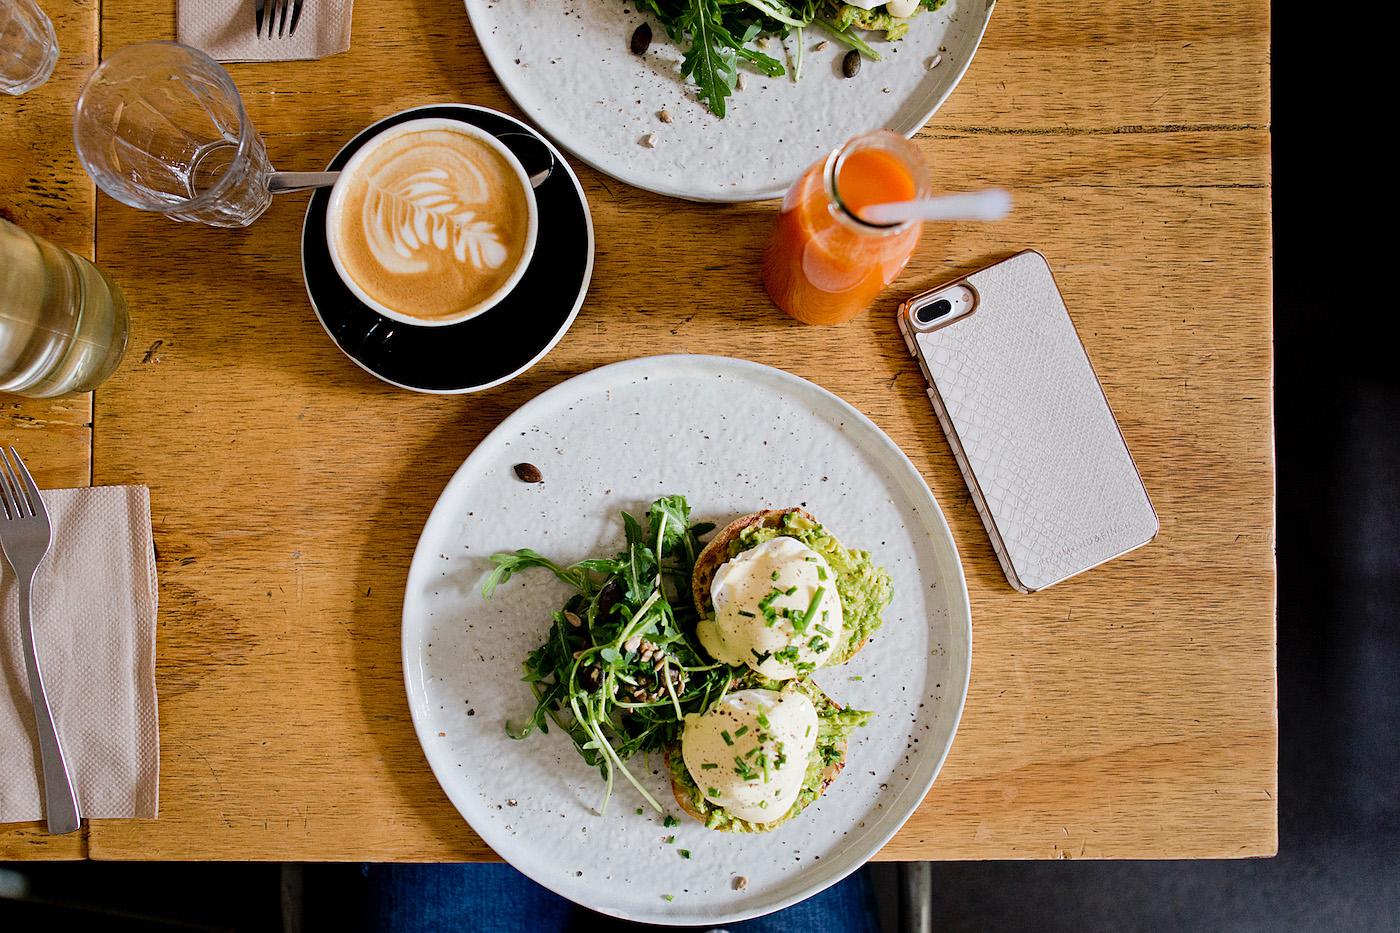 Wwwthegoldenbuncom Richmond Finch Cases Kaffeebar Berlin